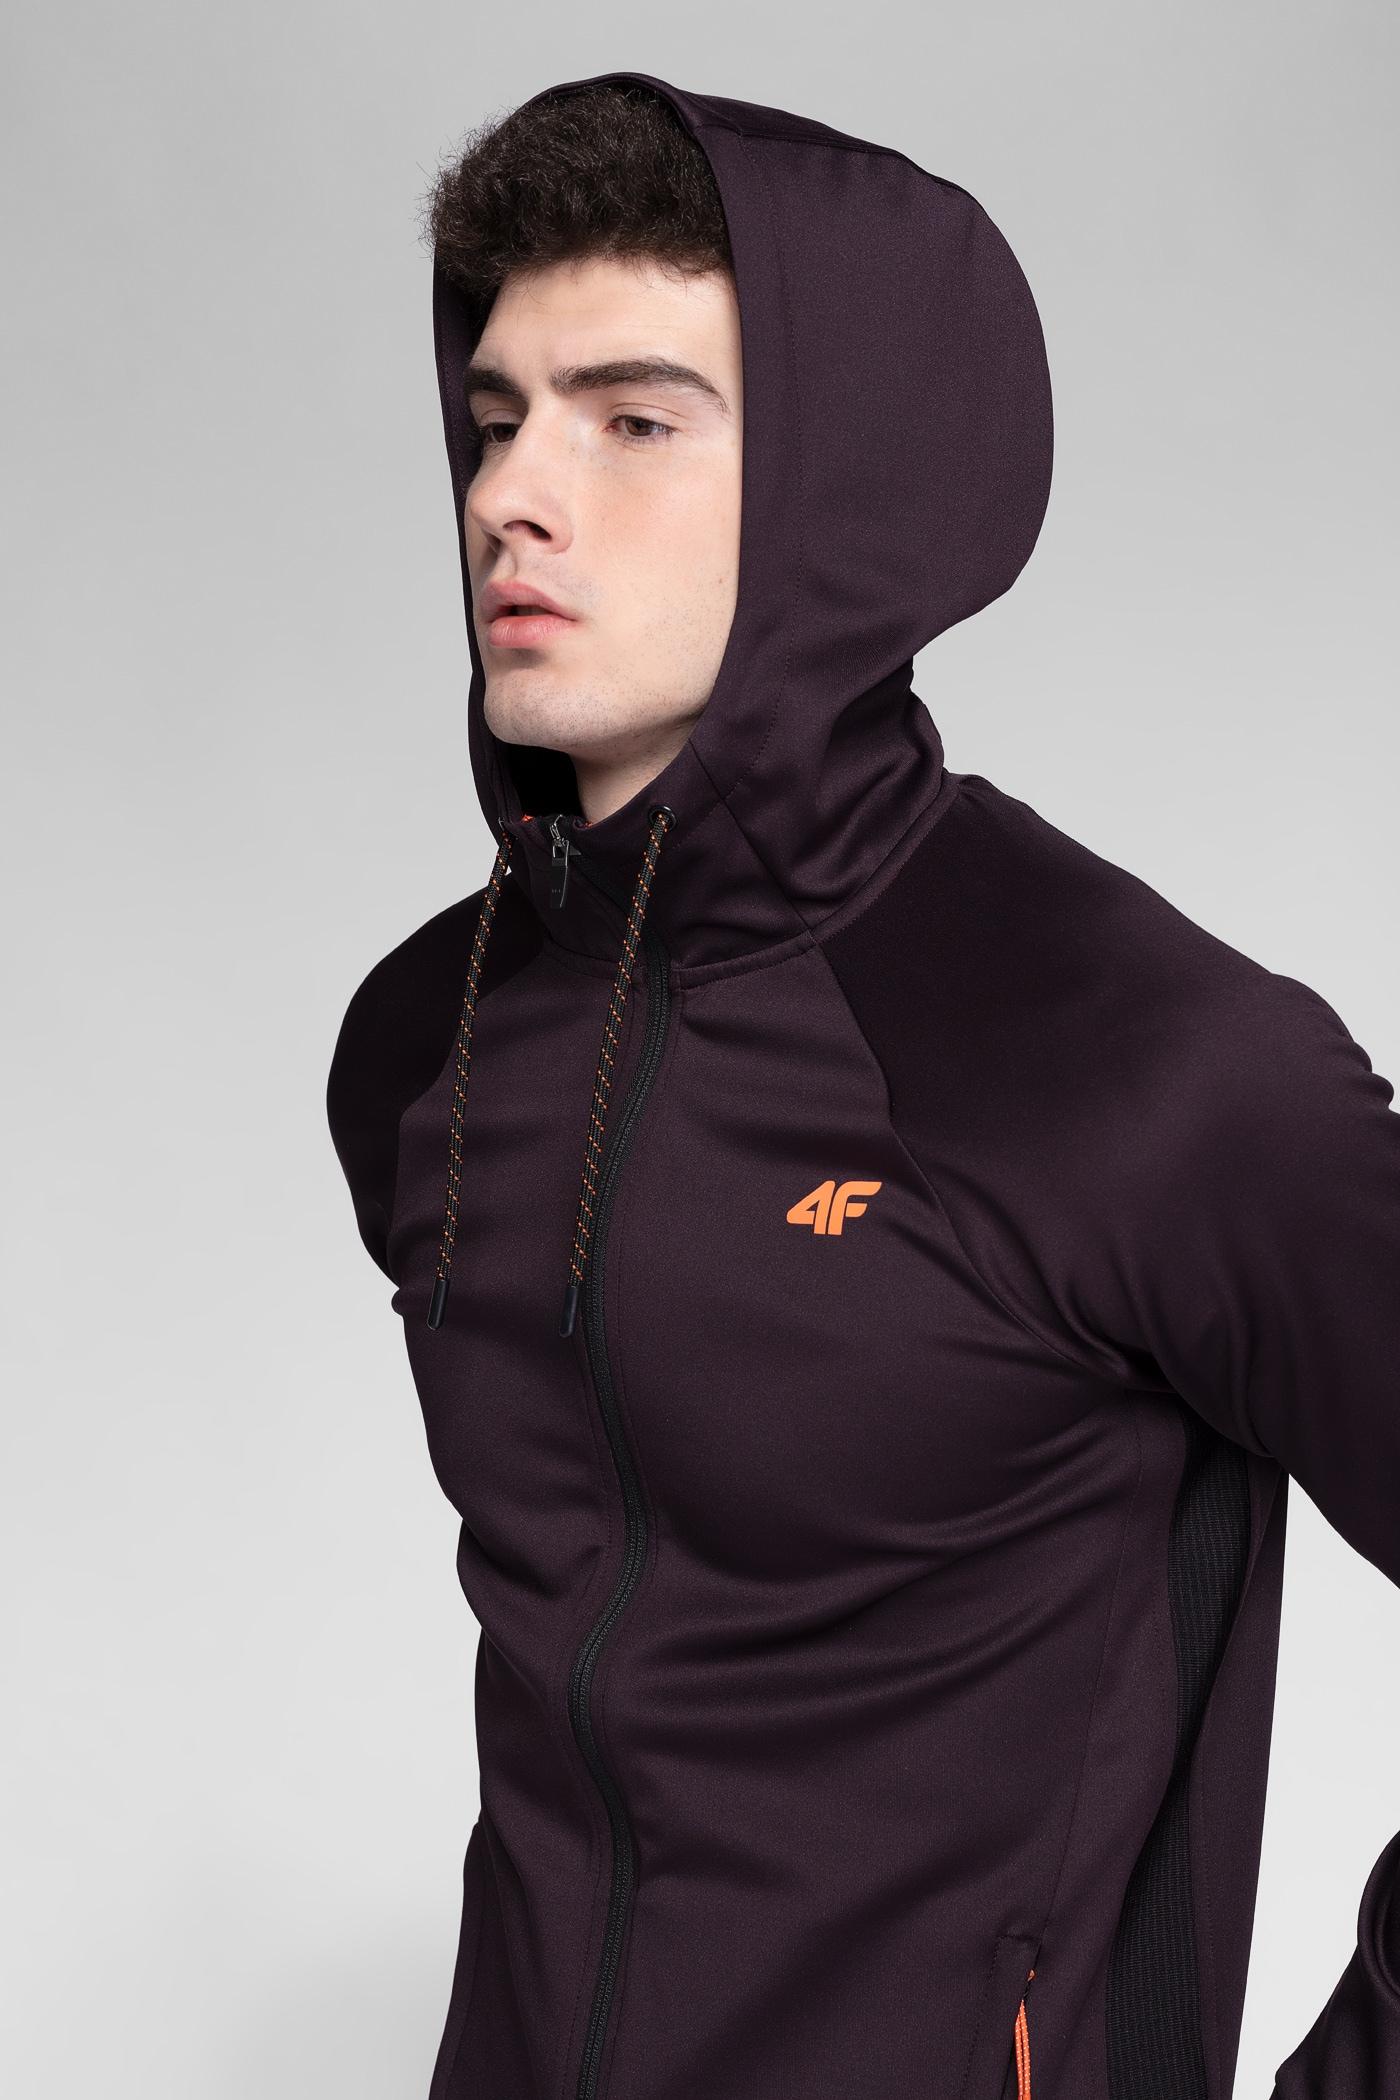 a6415d11 Men's active hoodie BLMF274 - burgundy